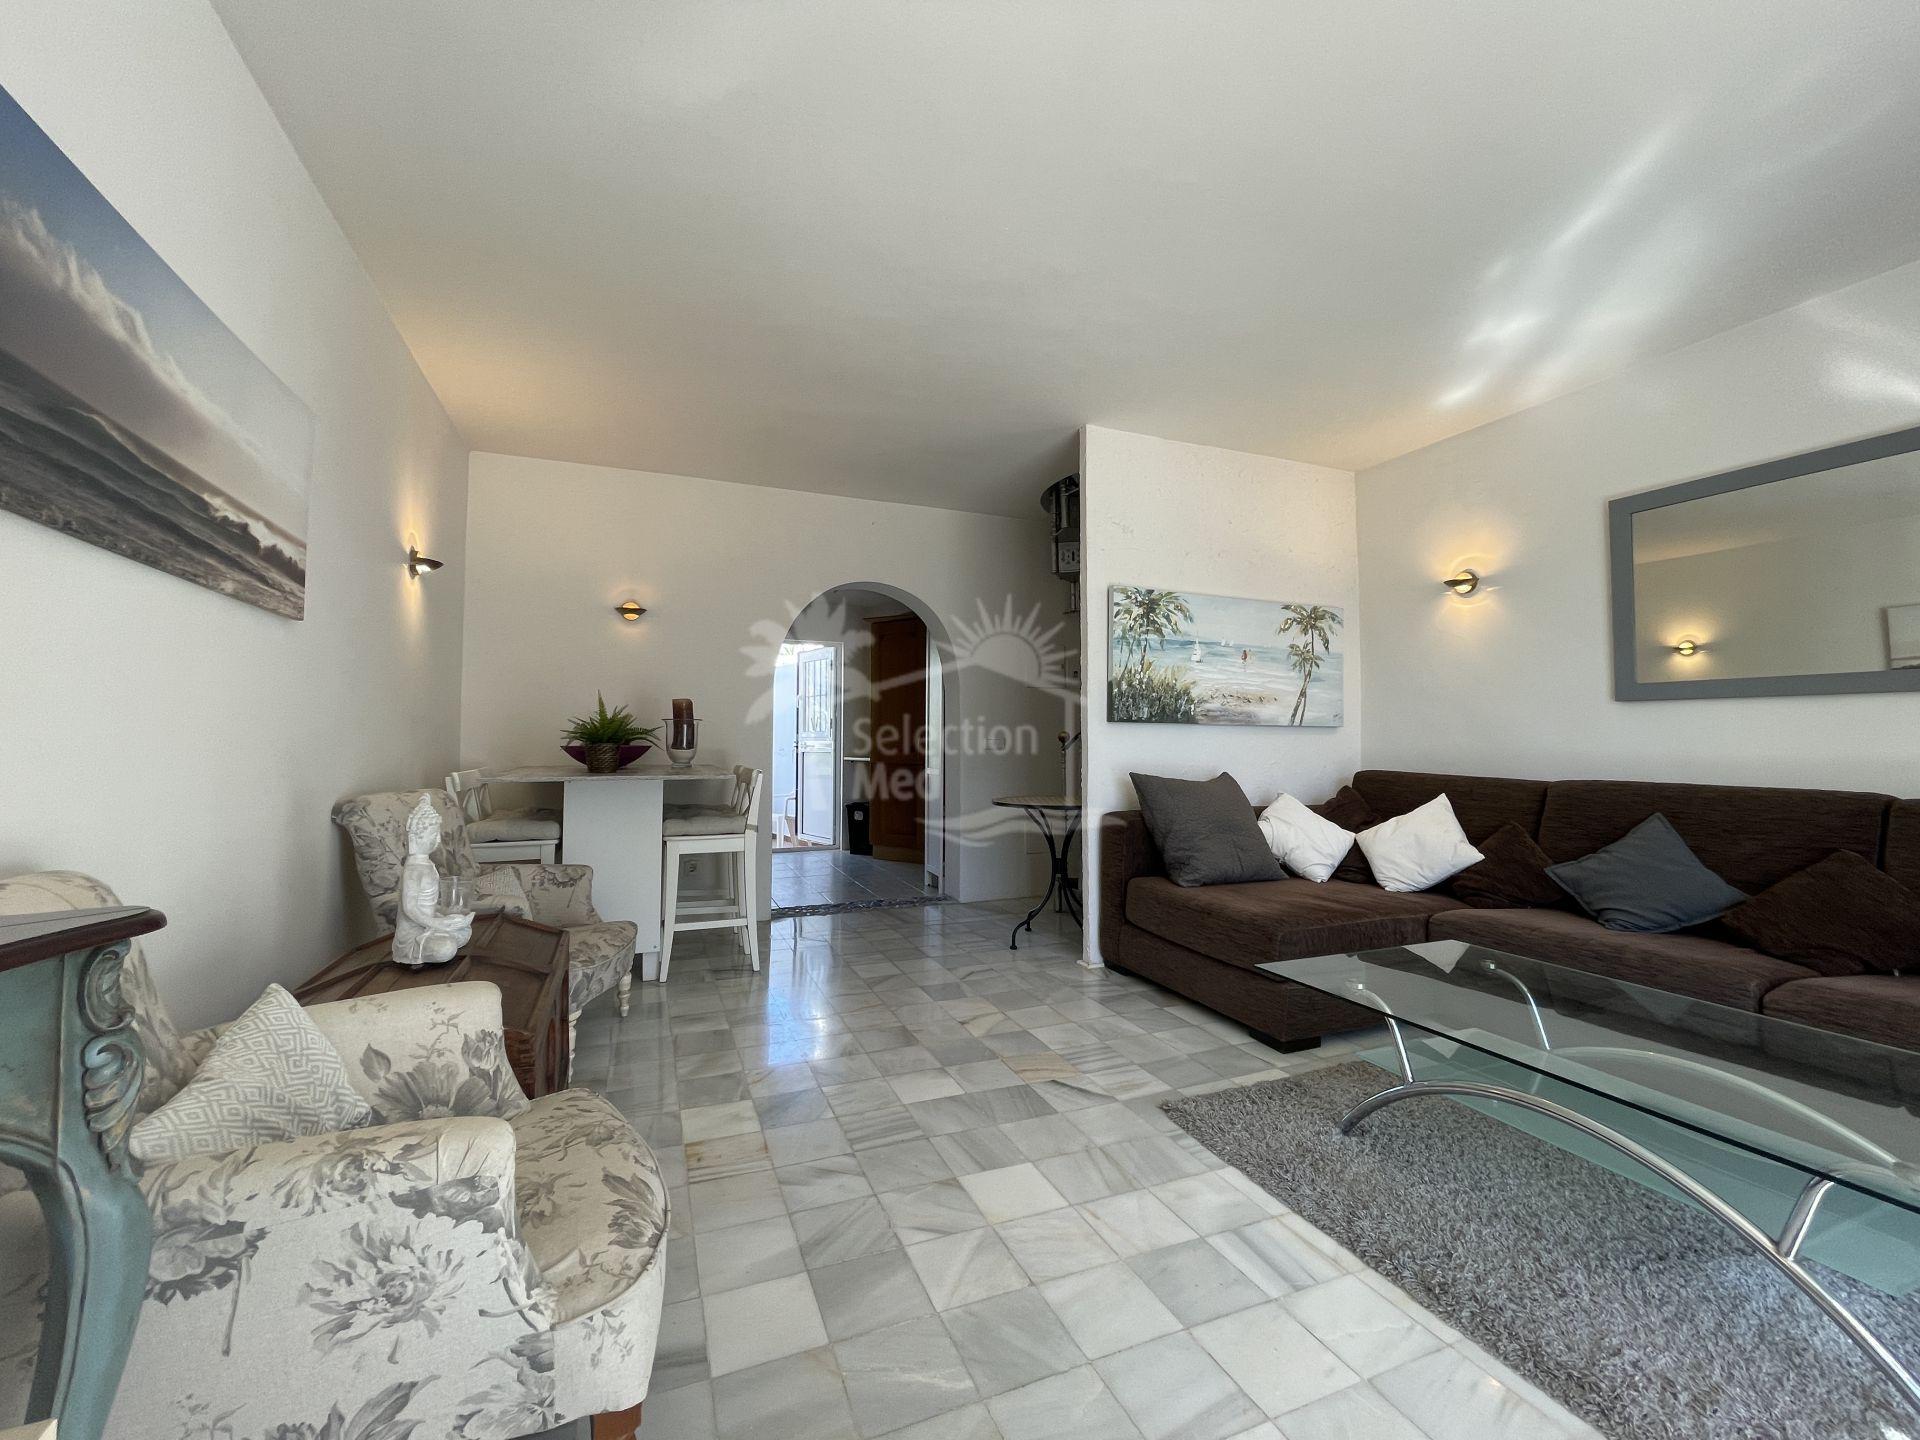 Semi Detached House in Rio Real, Marbella